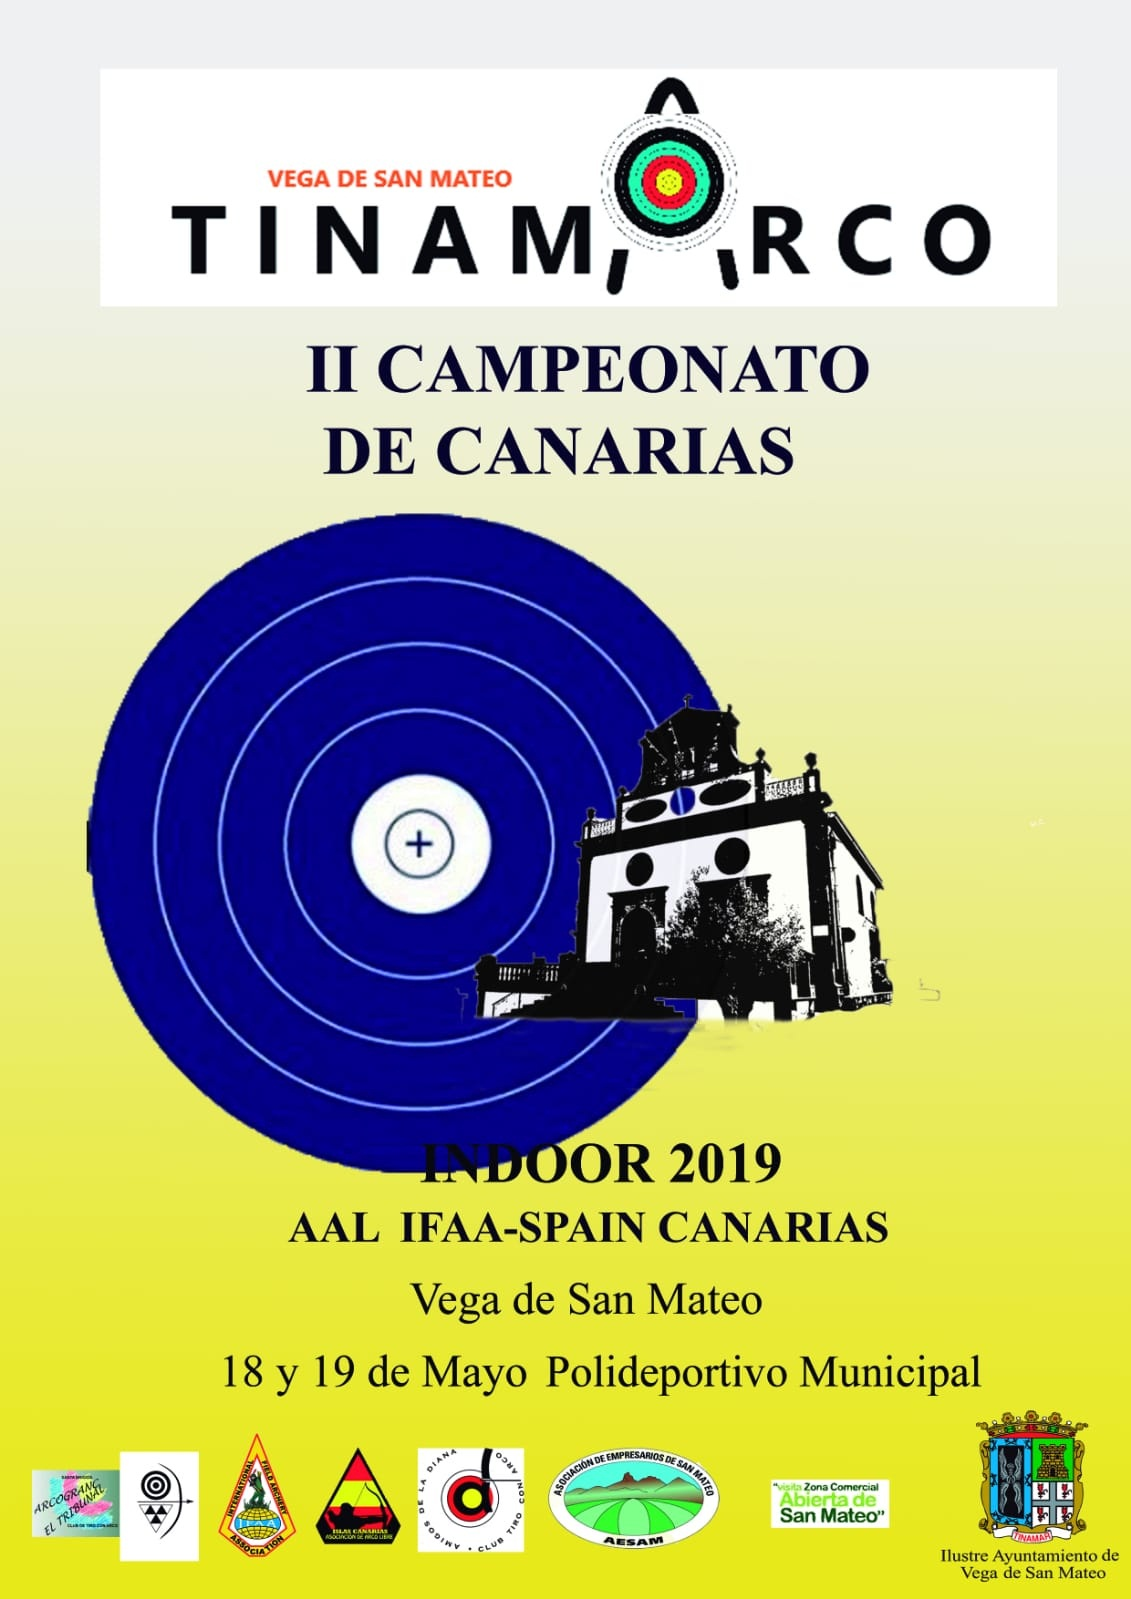 Tinamarco